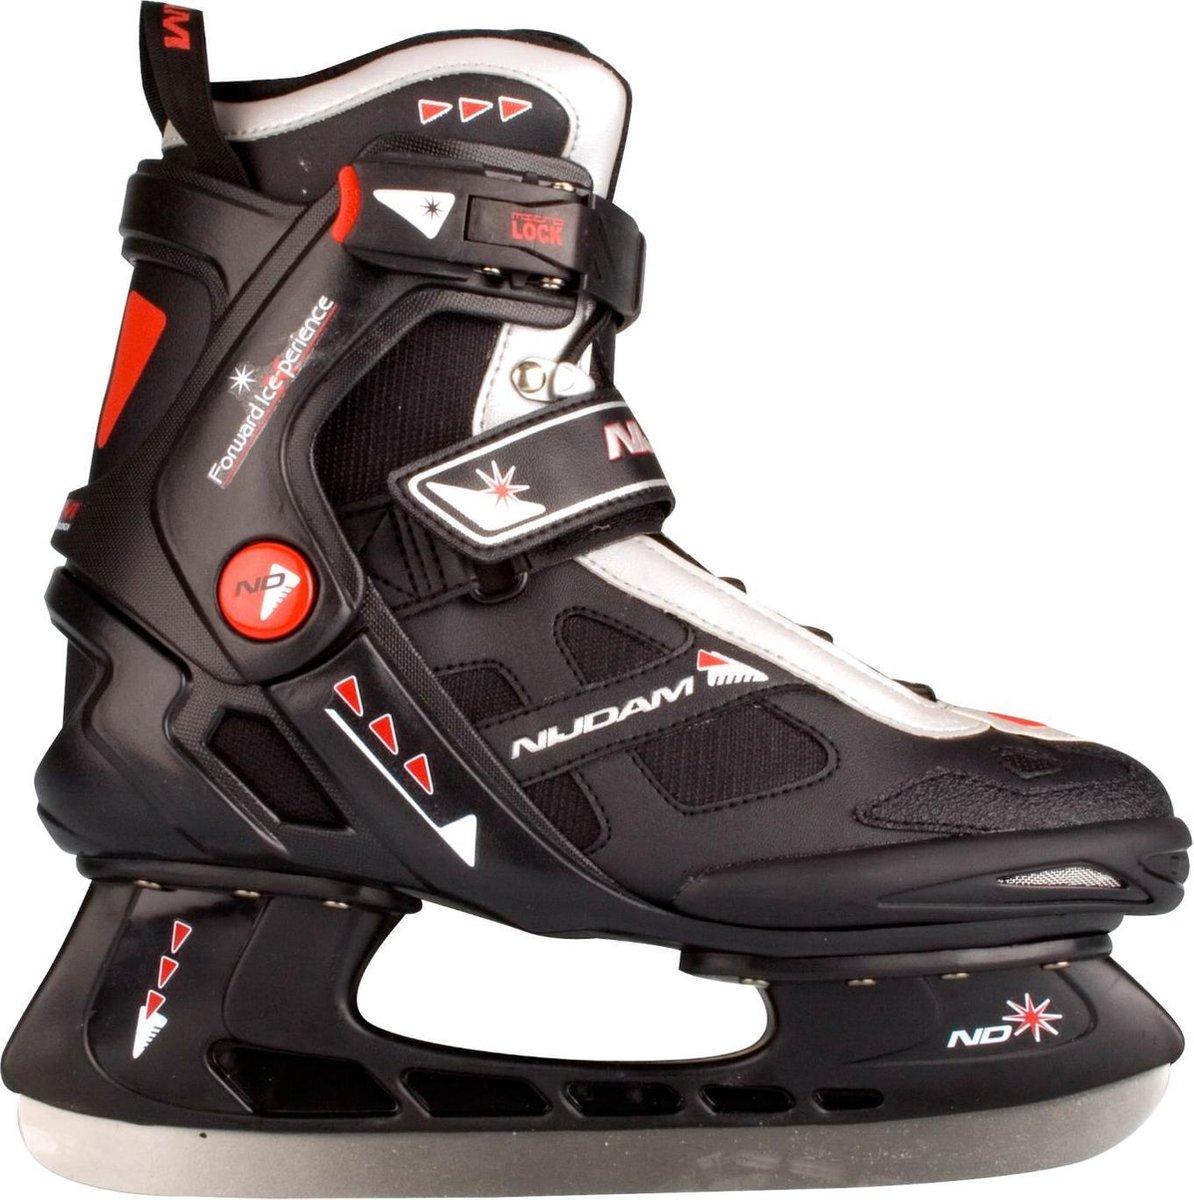 Nijdam IJshockeyschaats - Semi-Softboot - Zwart/Zilver/Rood - 42